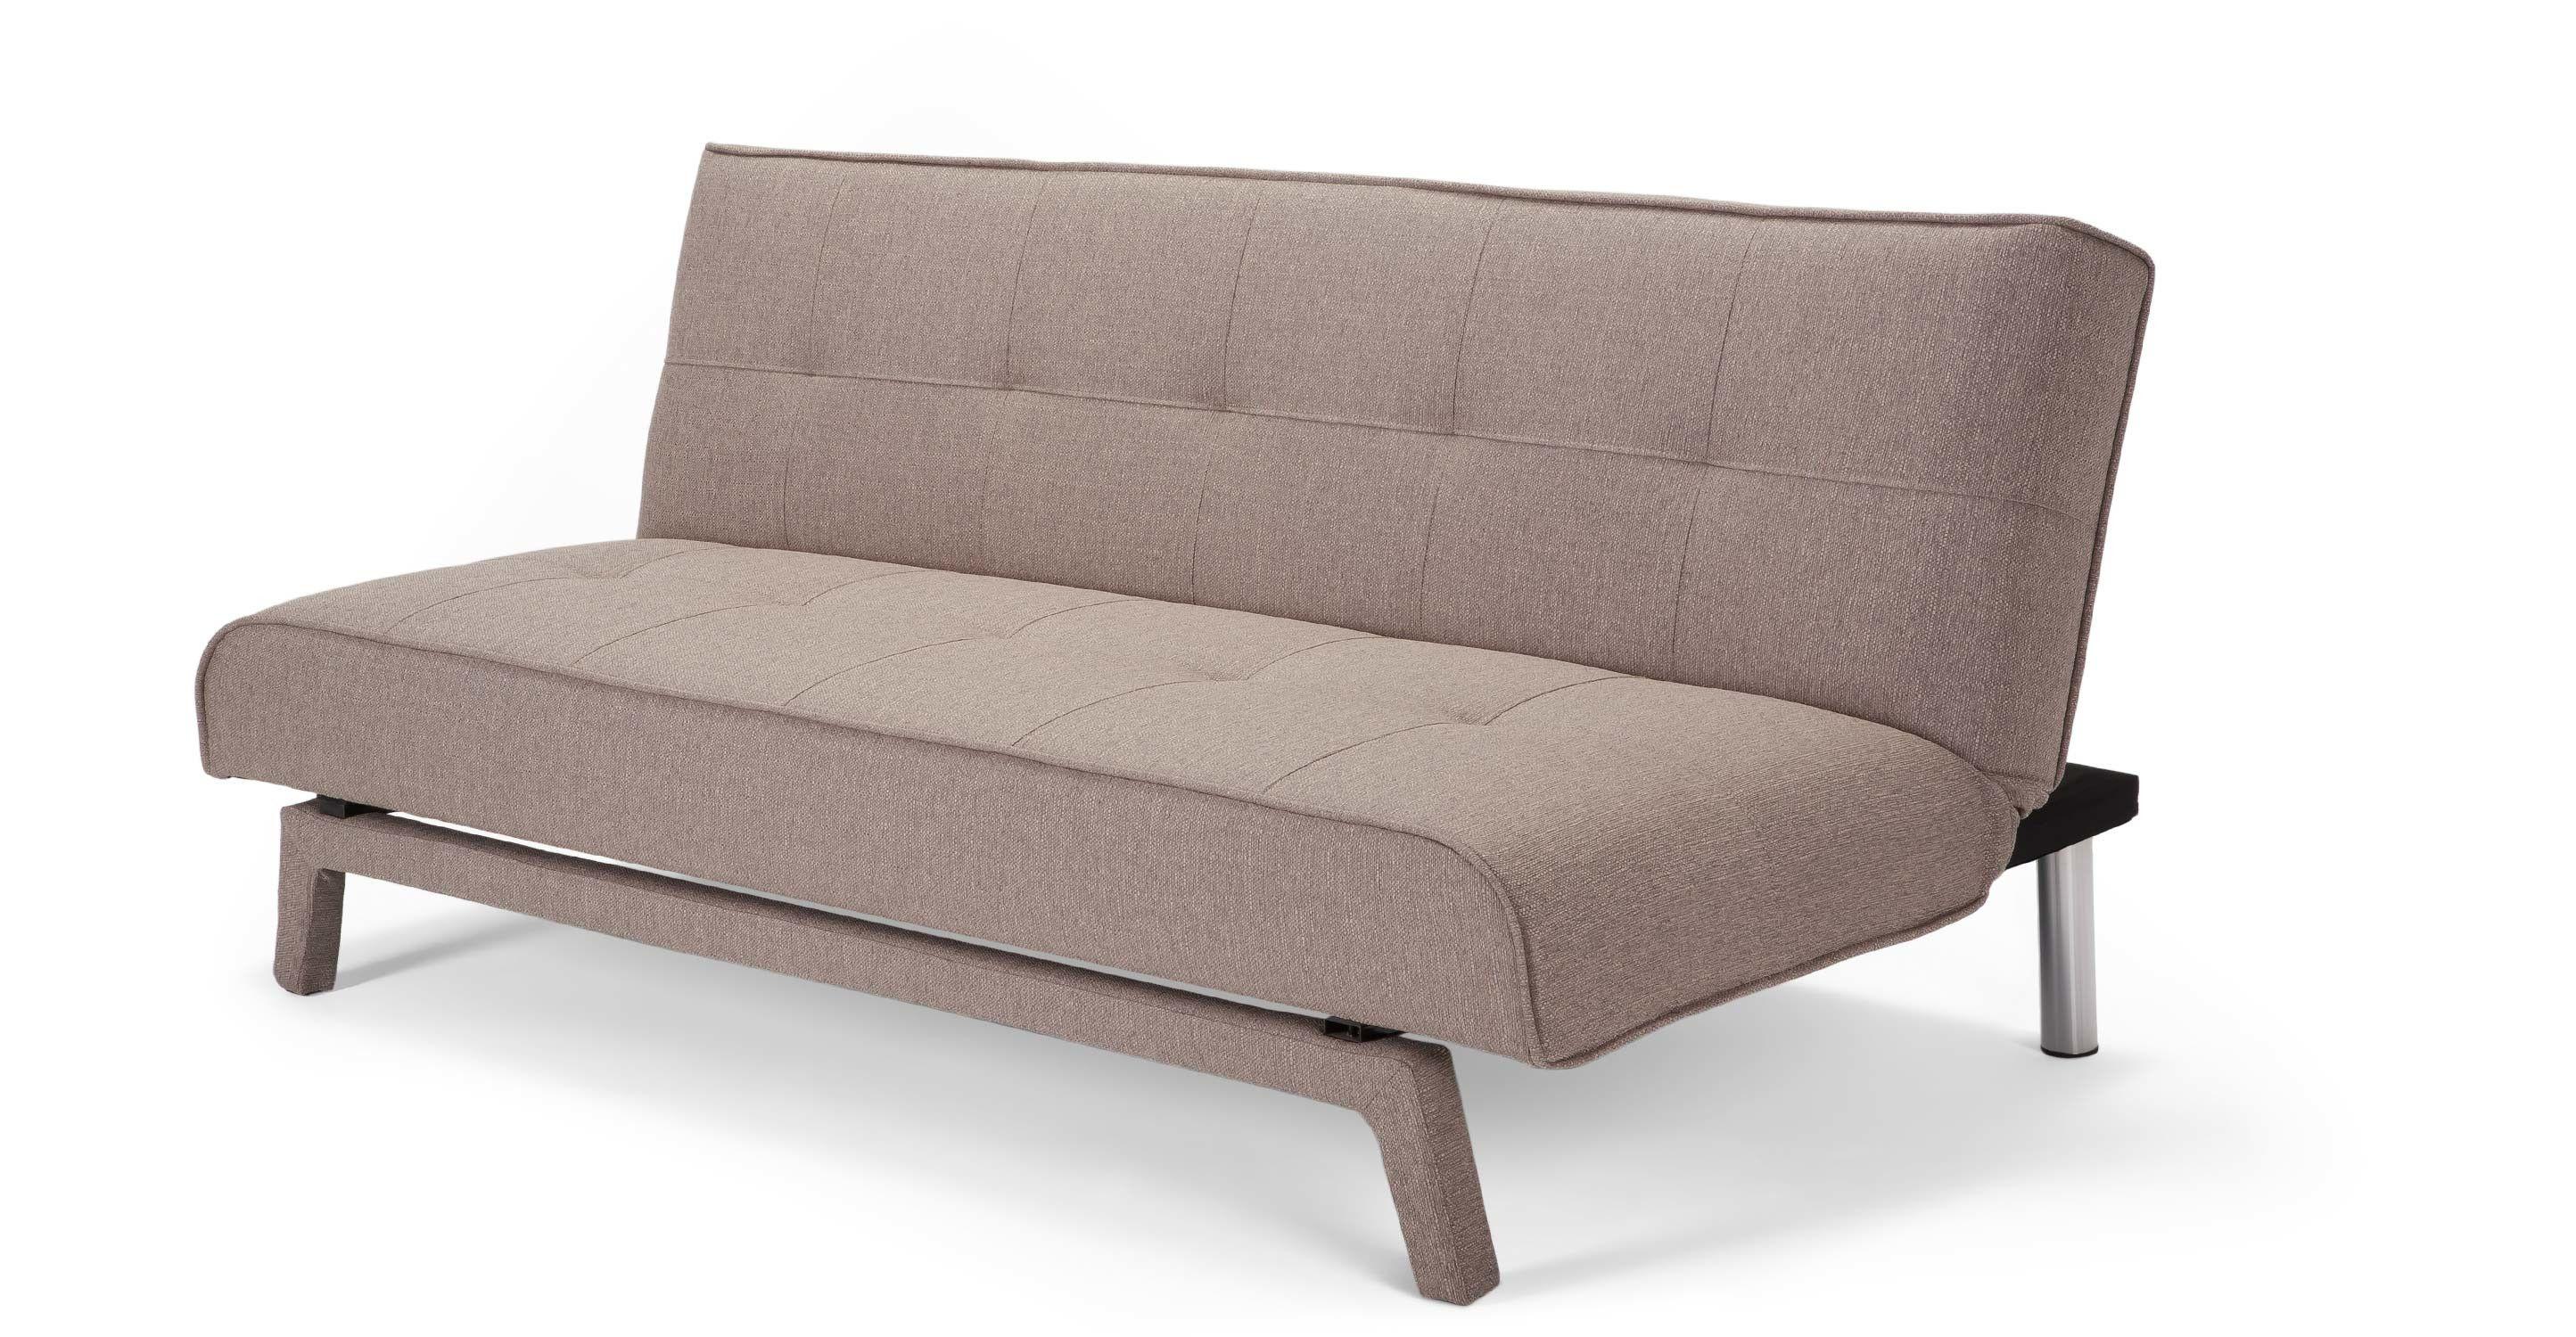 Yoko Un Canape Convertible Beige Toute Petite Chambre Sofa